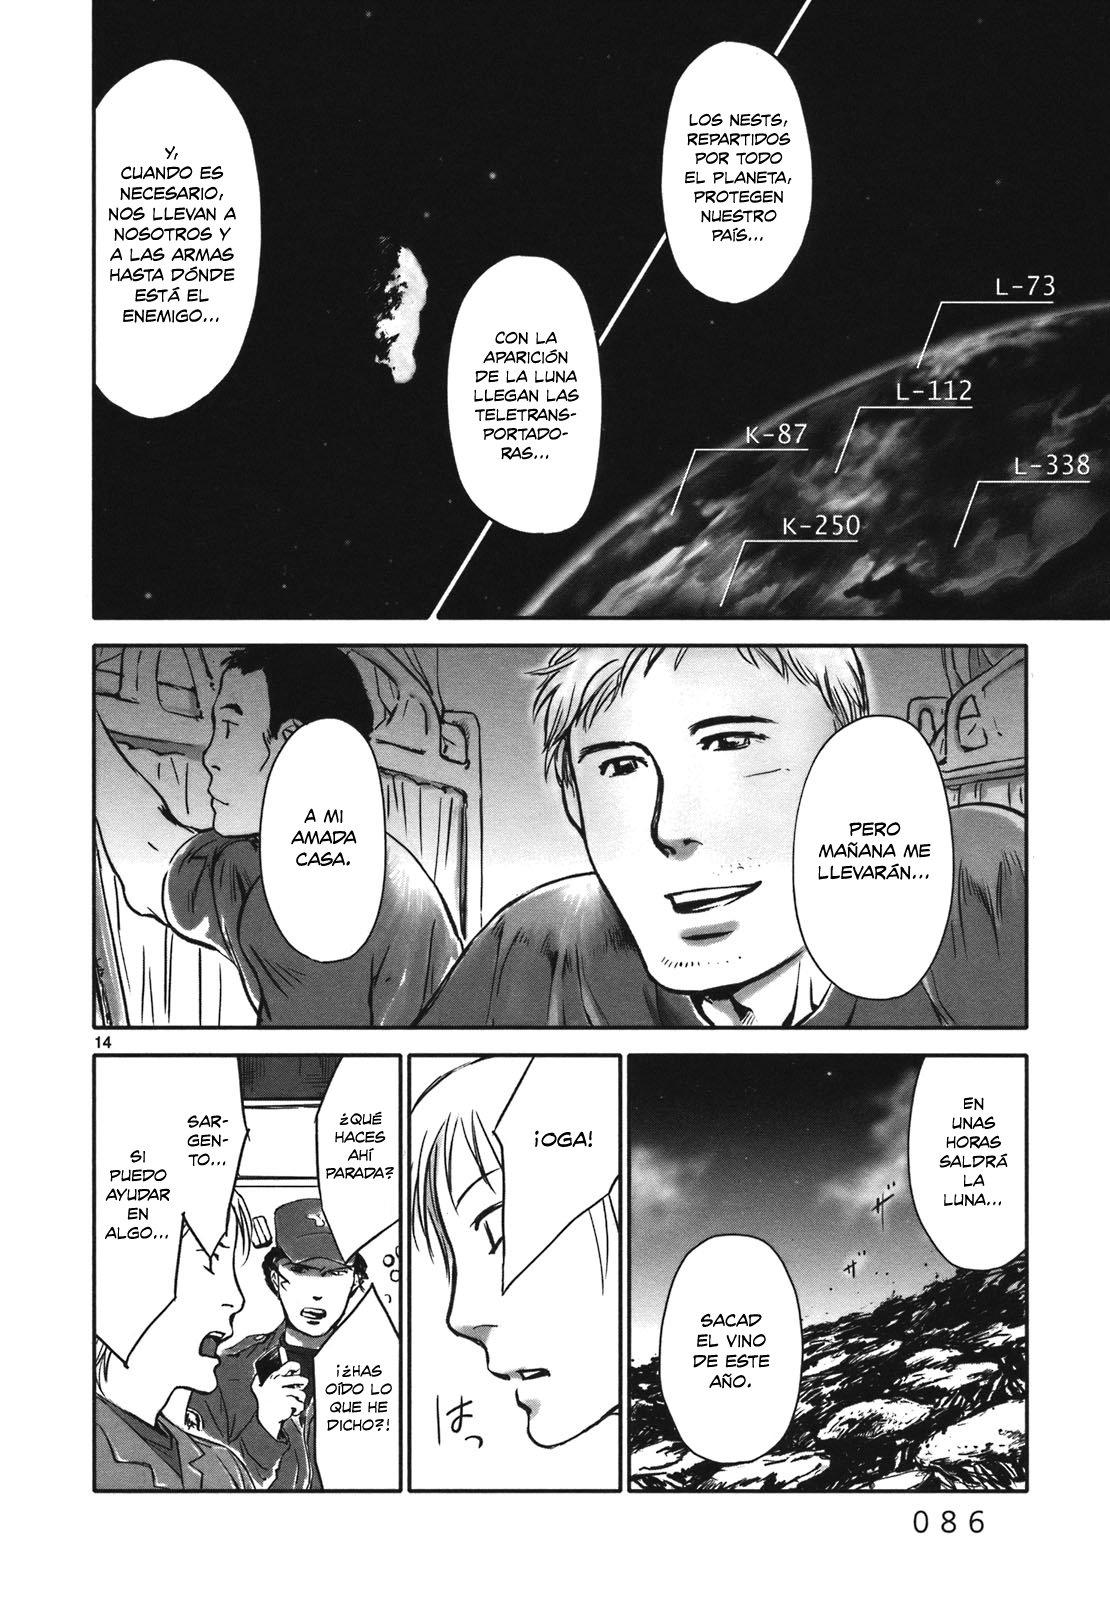 https://nine.mangadogs.com/es_manga/pic8/7/36679/946758/f47abc33aef6c939600ade082dccc576.jpg Page 19